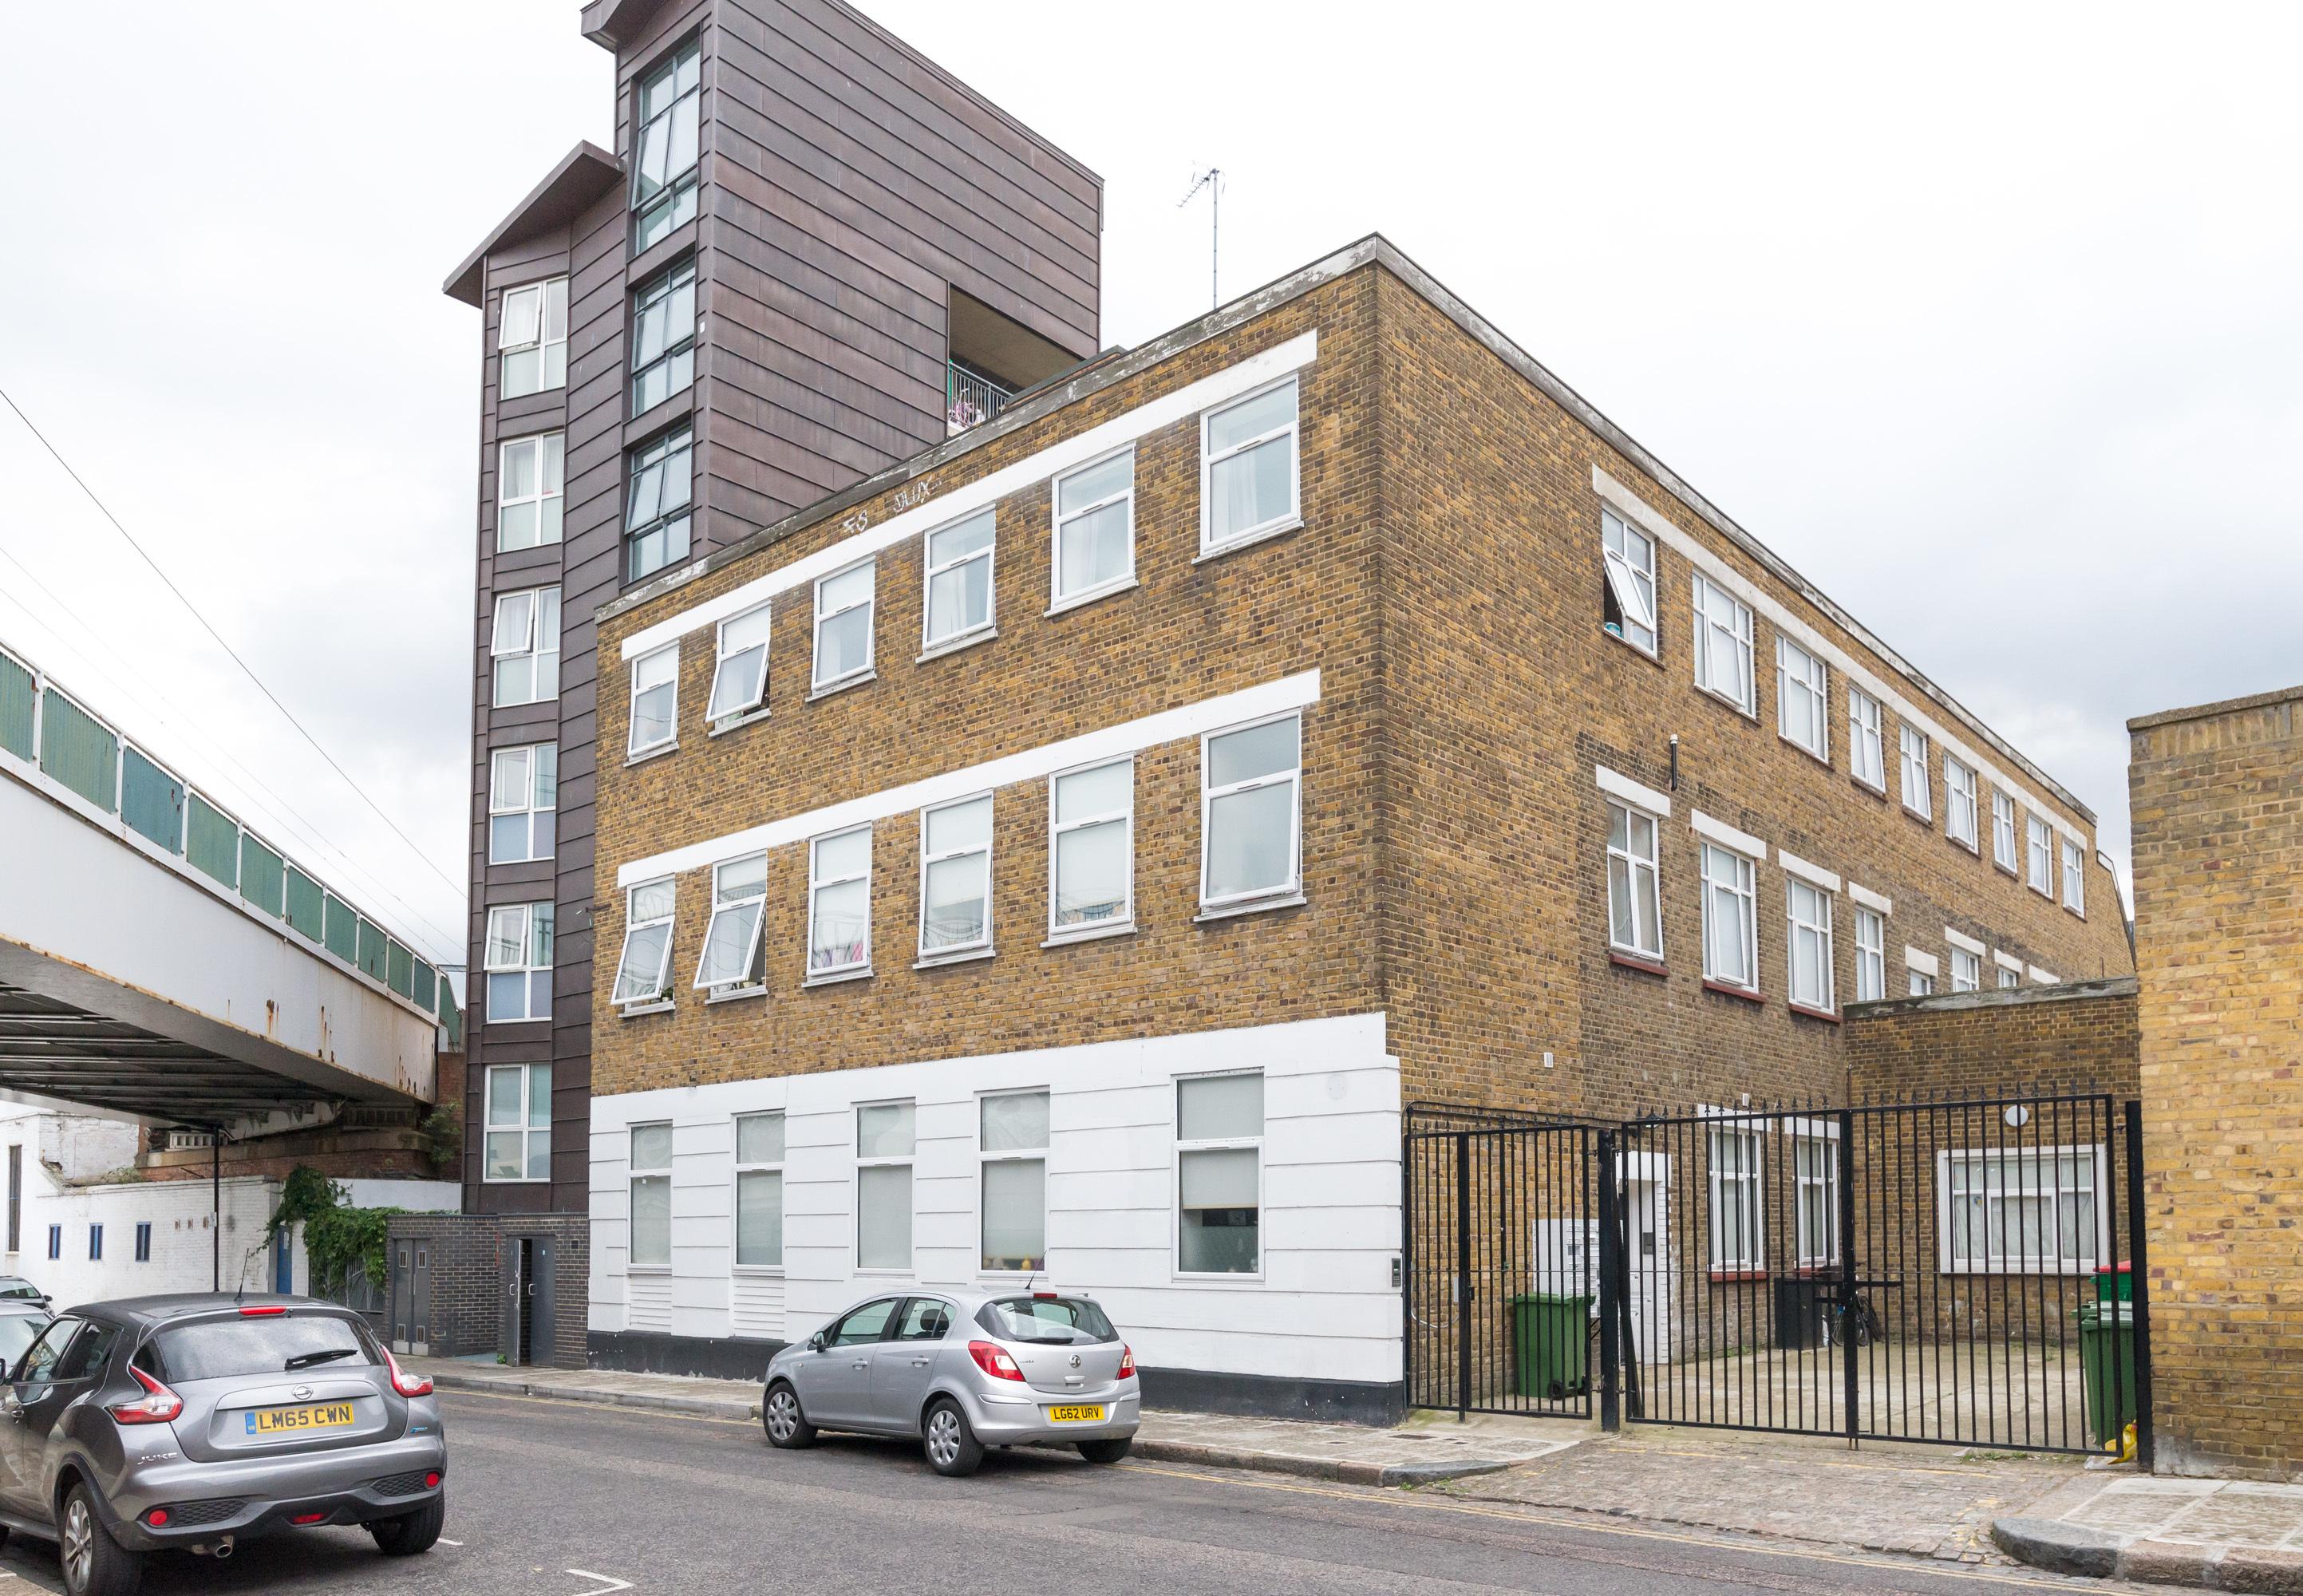 Flat 23  8 9  spring place  london nw5 3er. 9hww